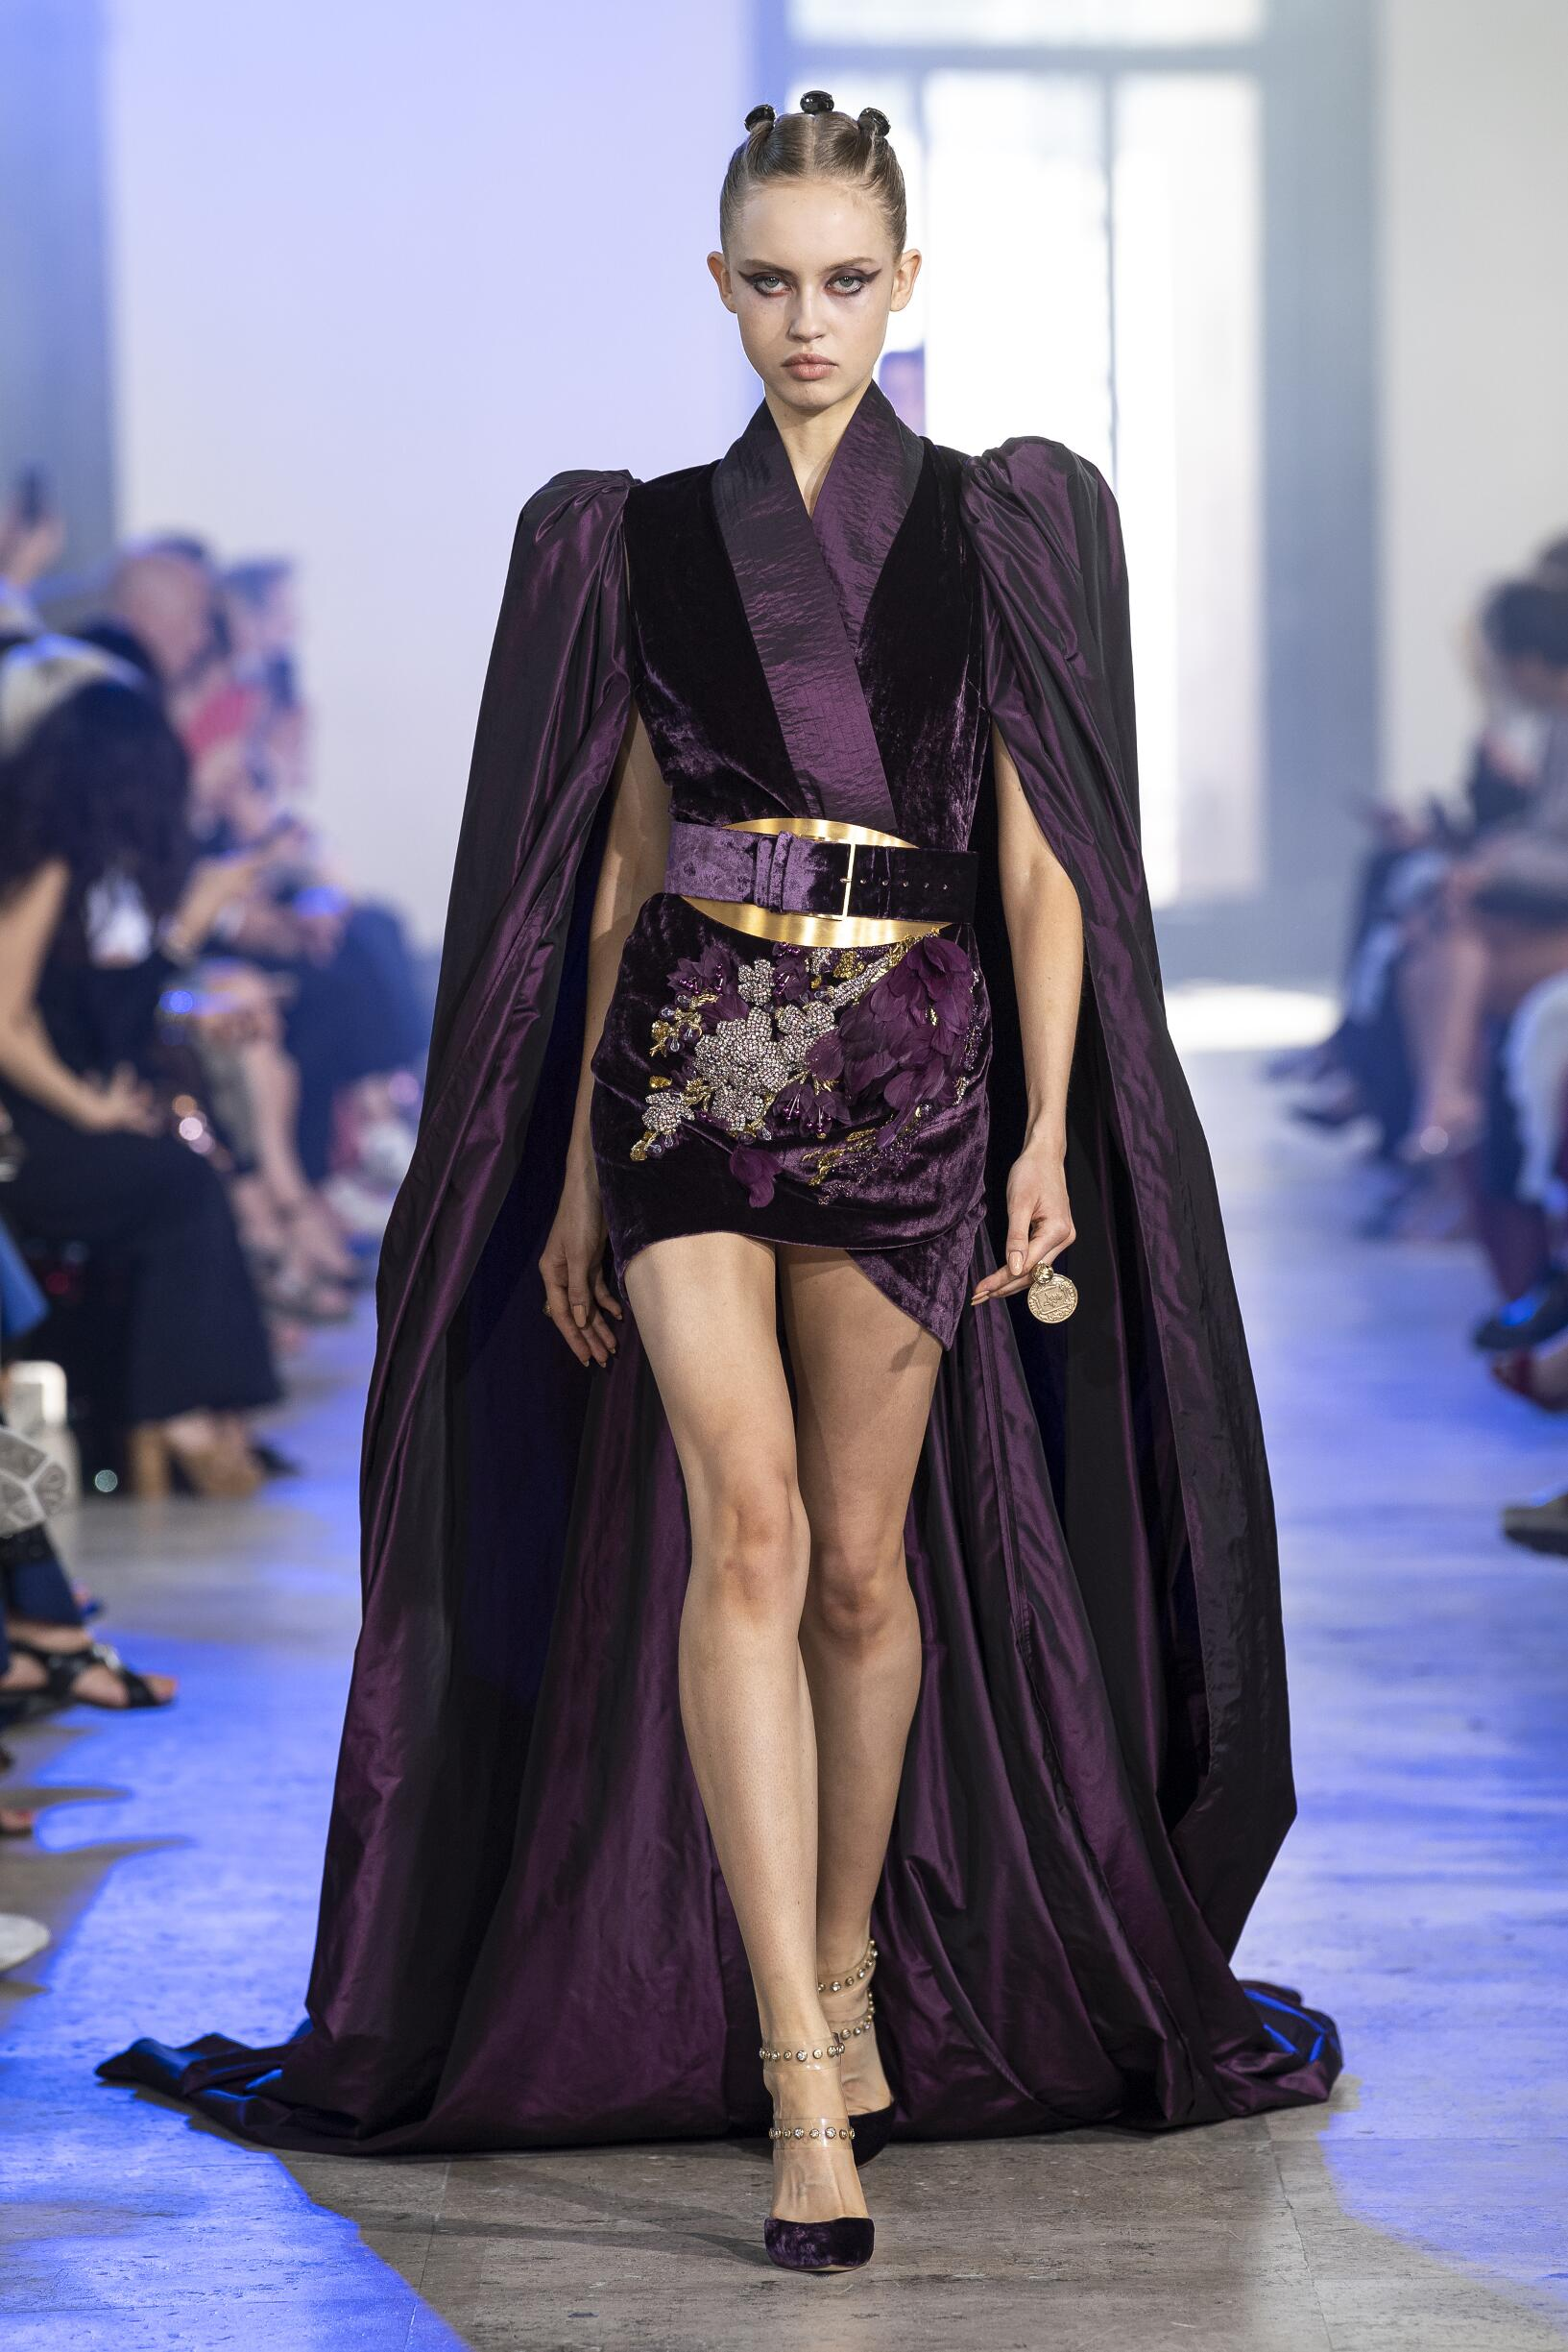 2019-20 Catwalk Elie Saab Haute Couture Winter